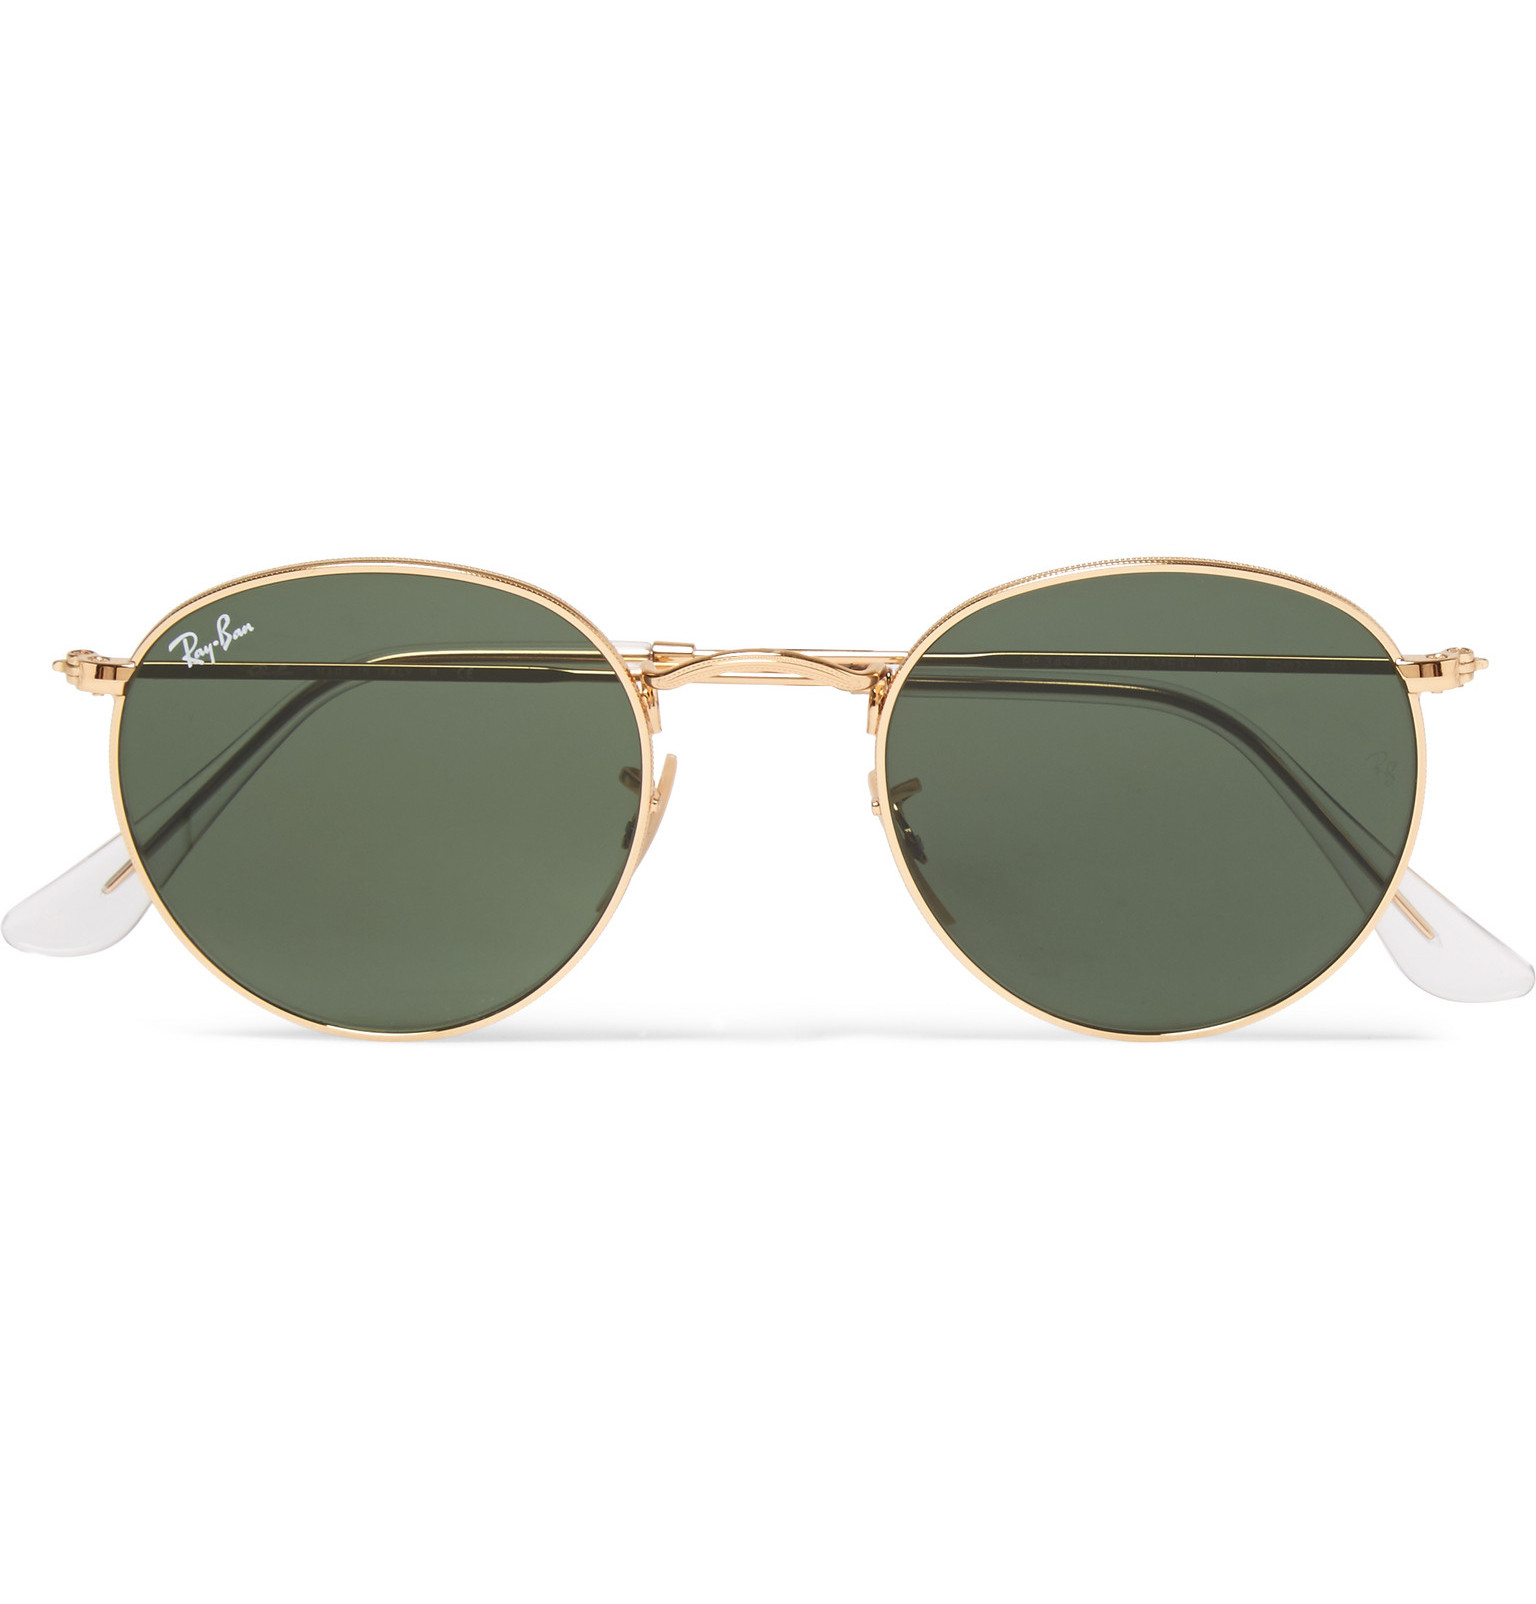 ray ban sunglasses gold frame louisiana bucket brigade